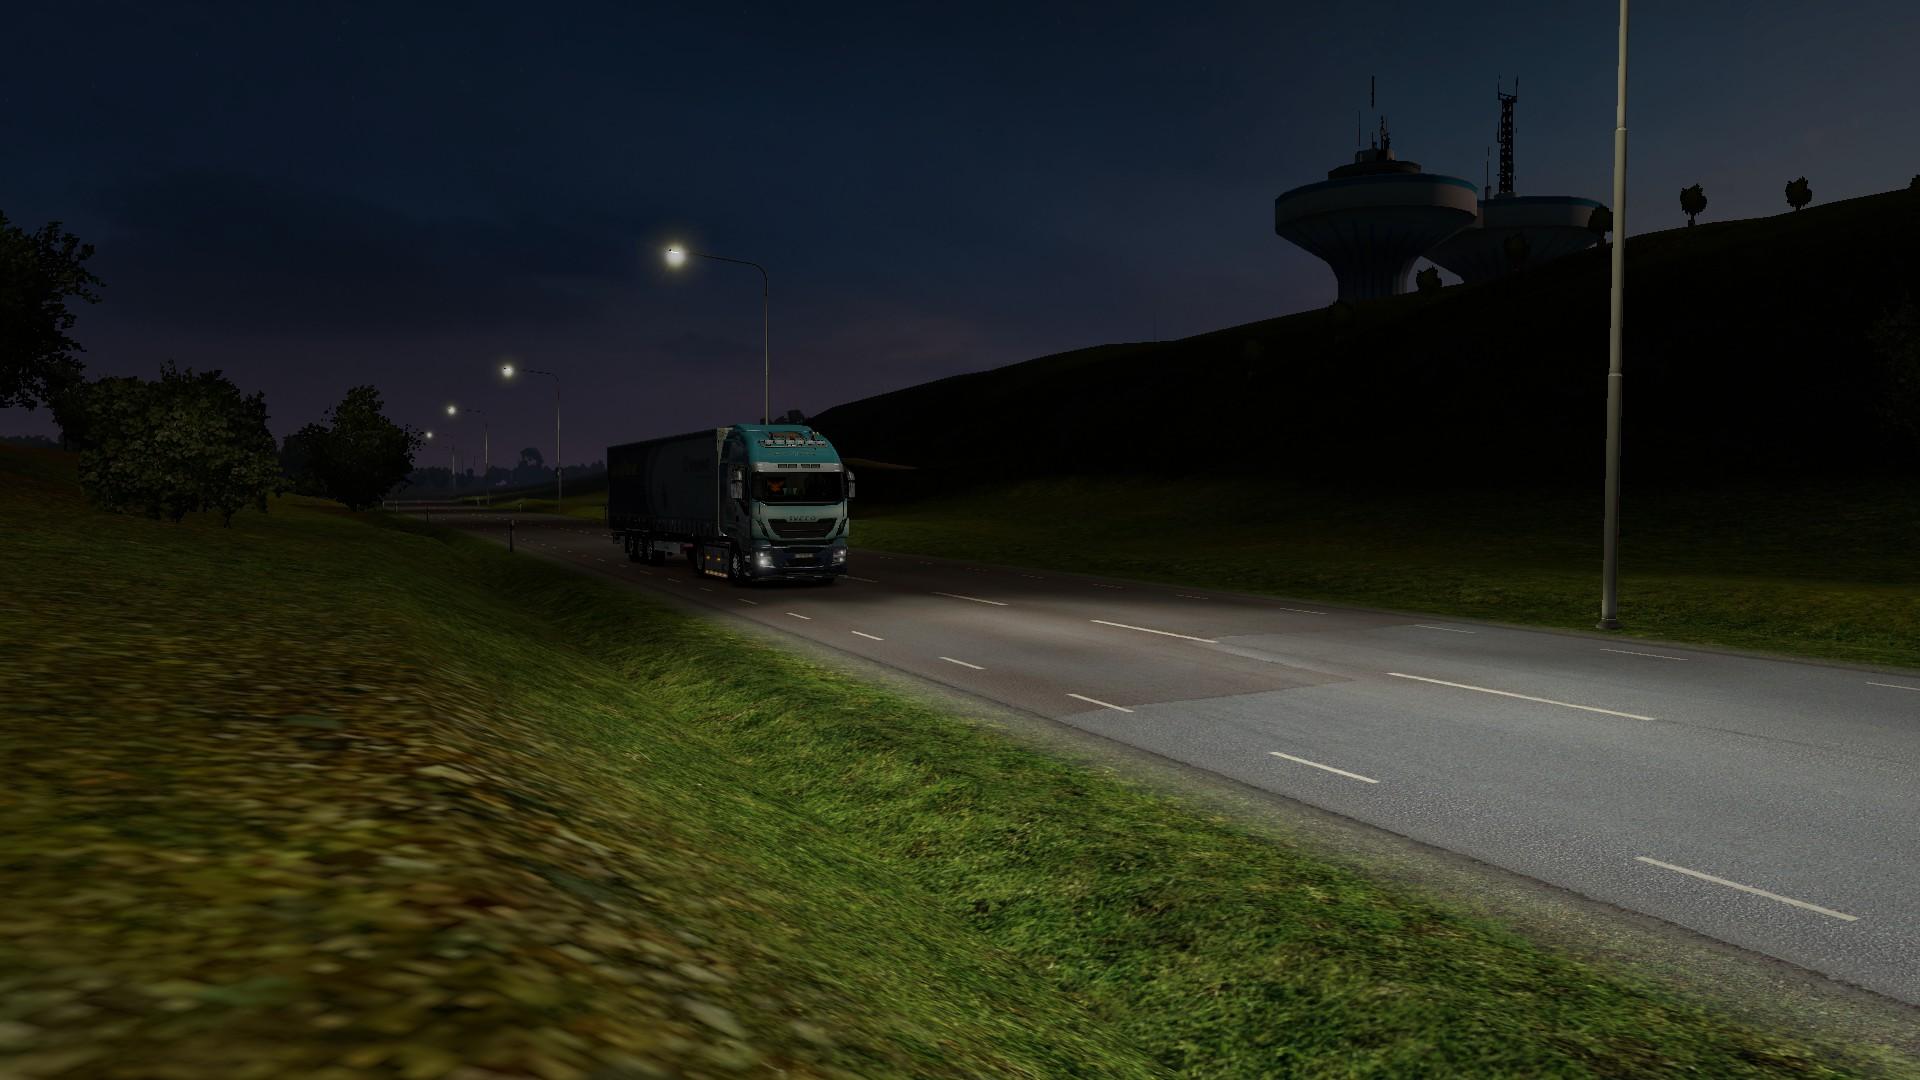 20180620140723_1.jpg - Euro Truck Simulator 2